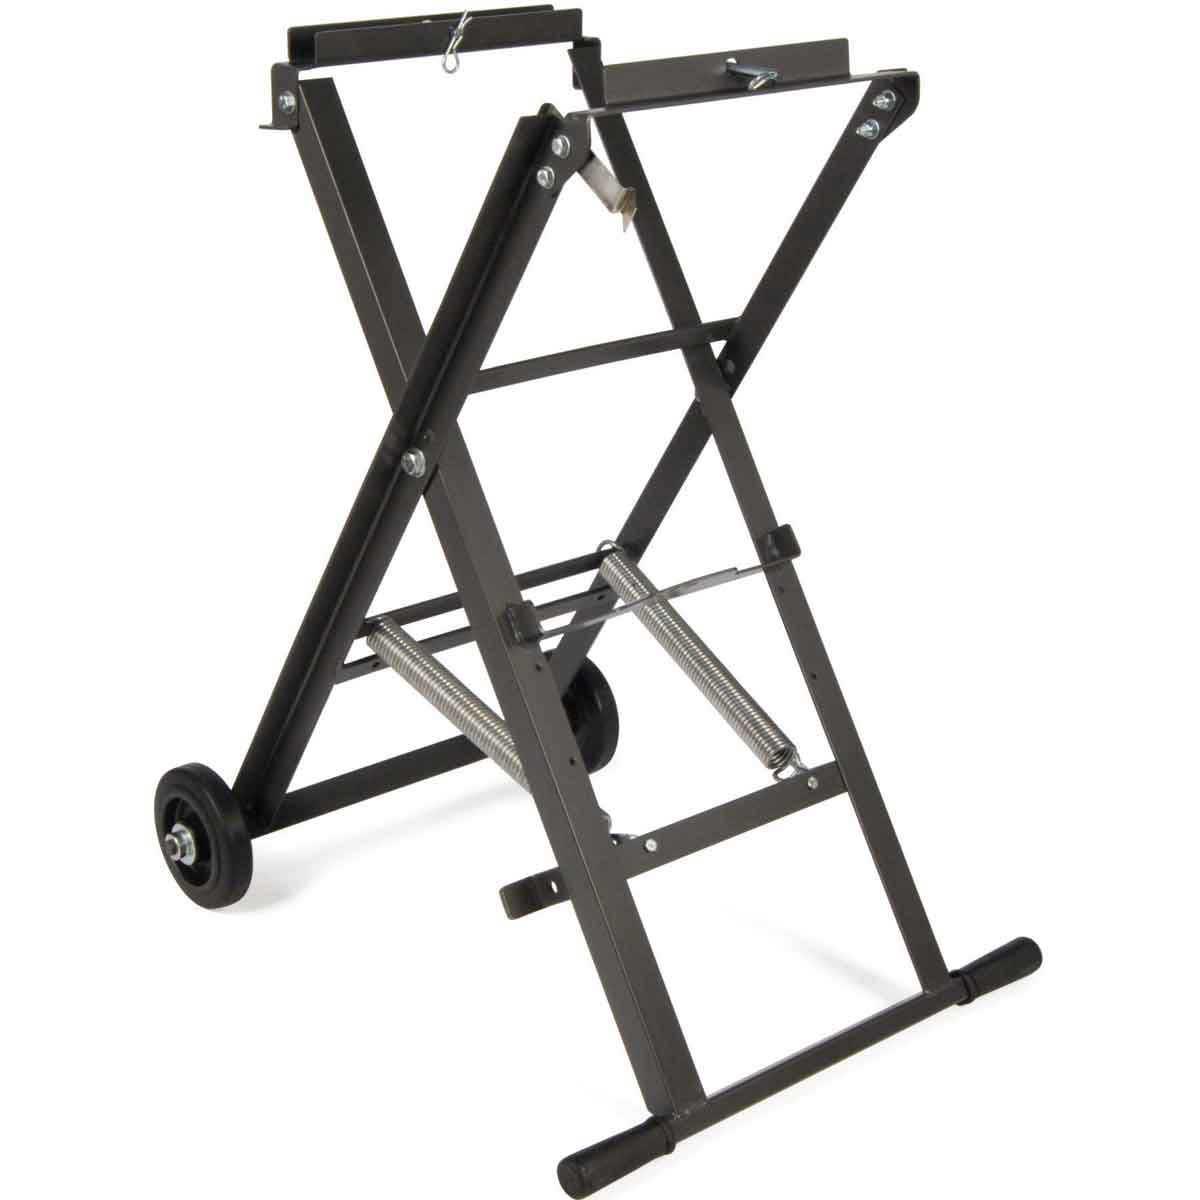 Adjustable Rolling Stand for Husqvarna Tile Saws